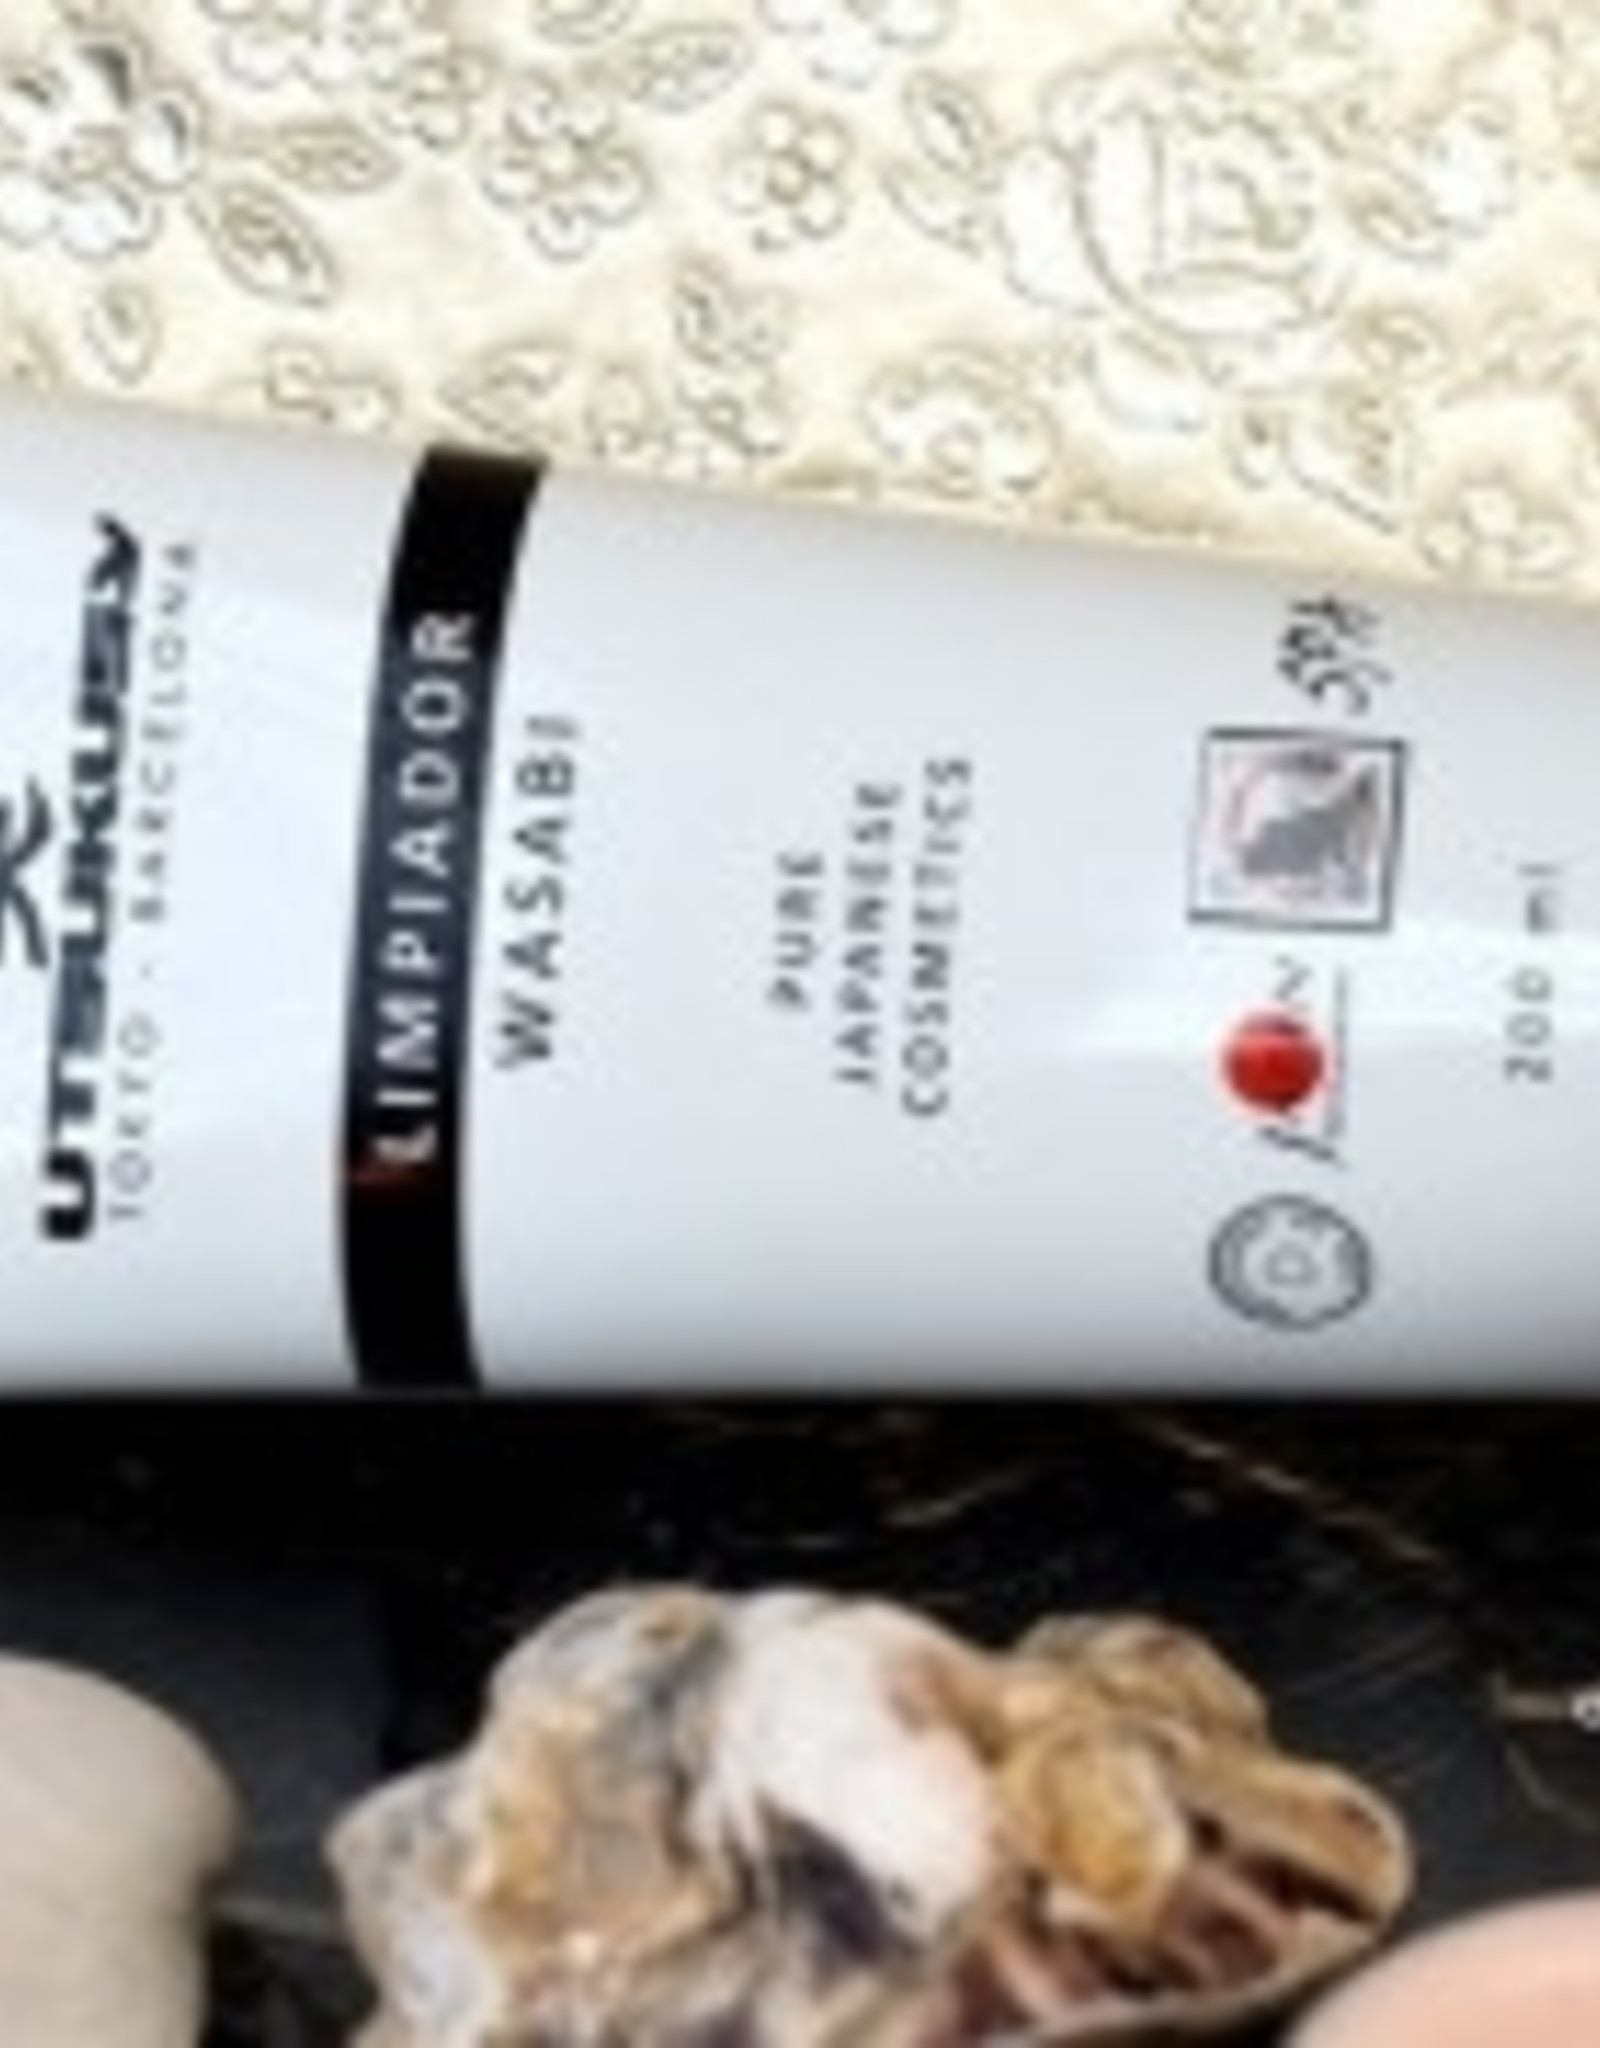 Utsukusy Shashimi Wasabi facial cleansing cream, tube 200ml